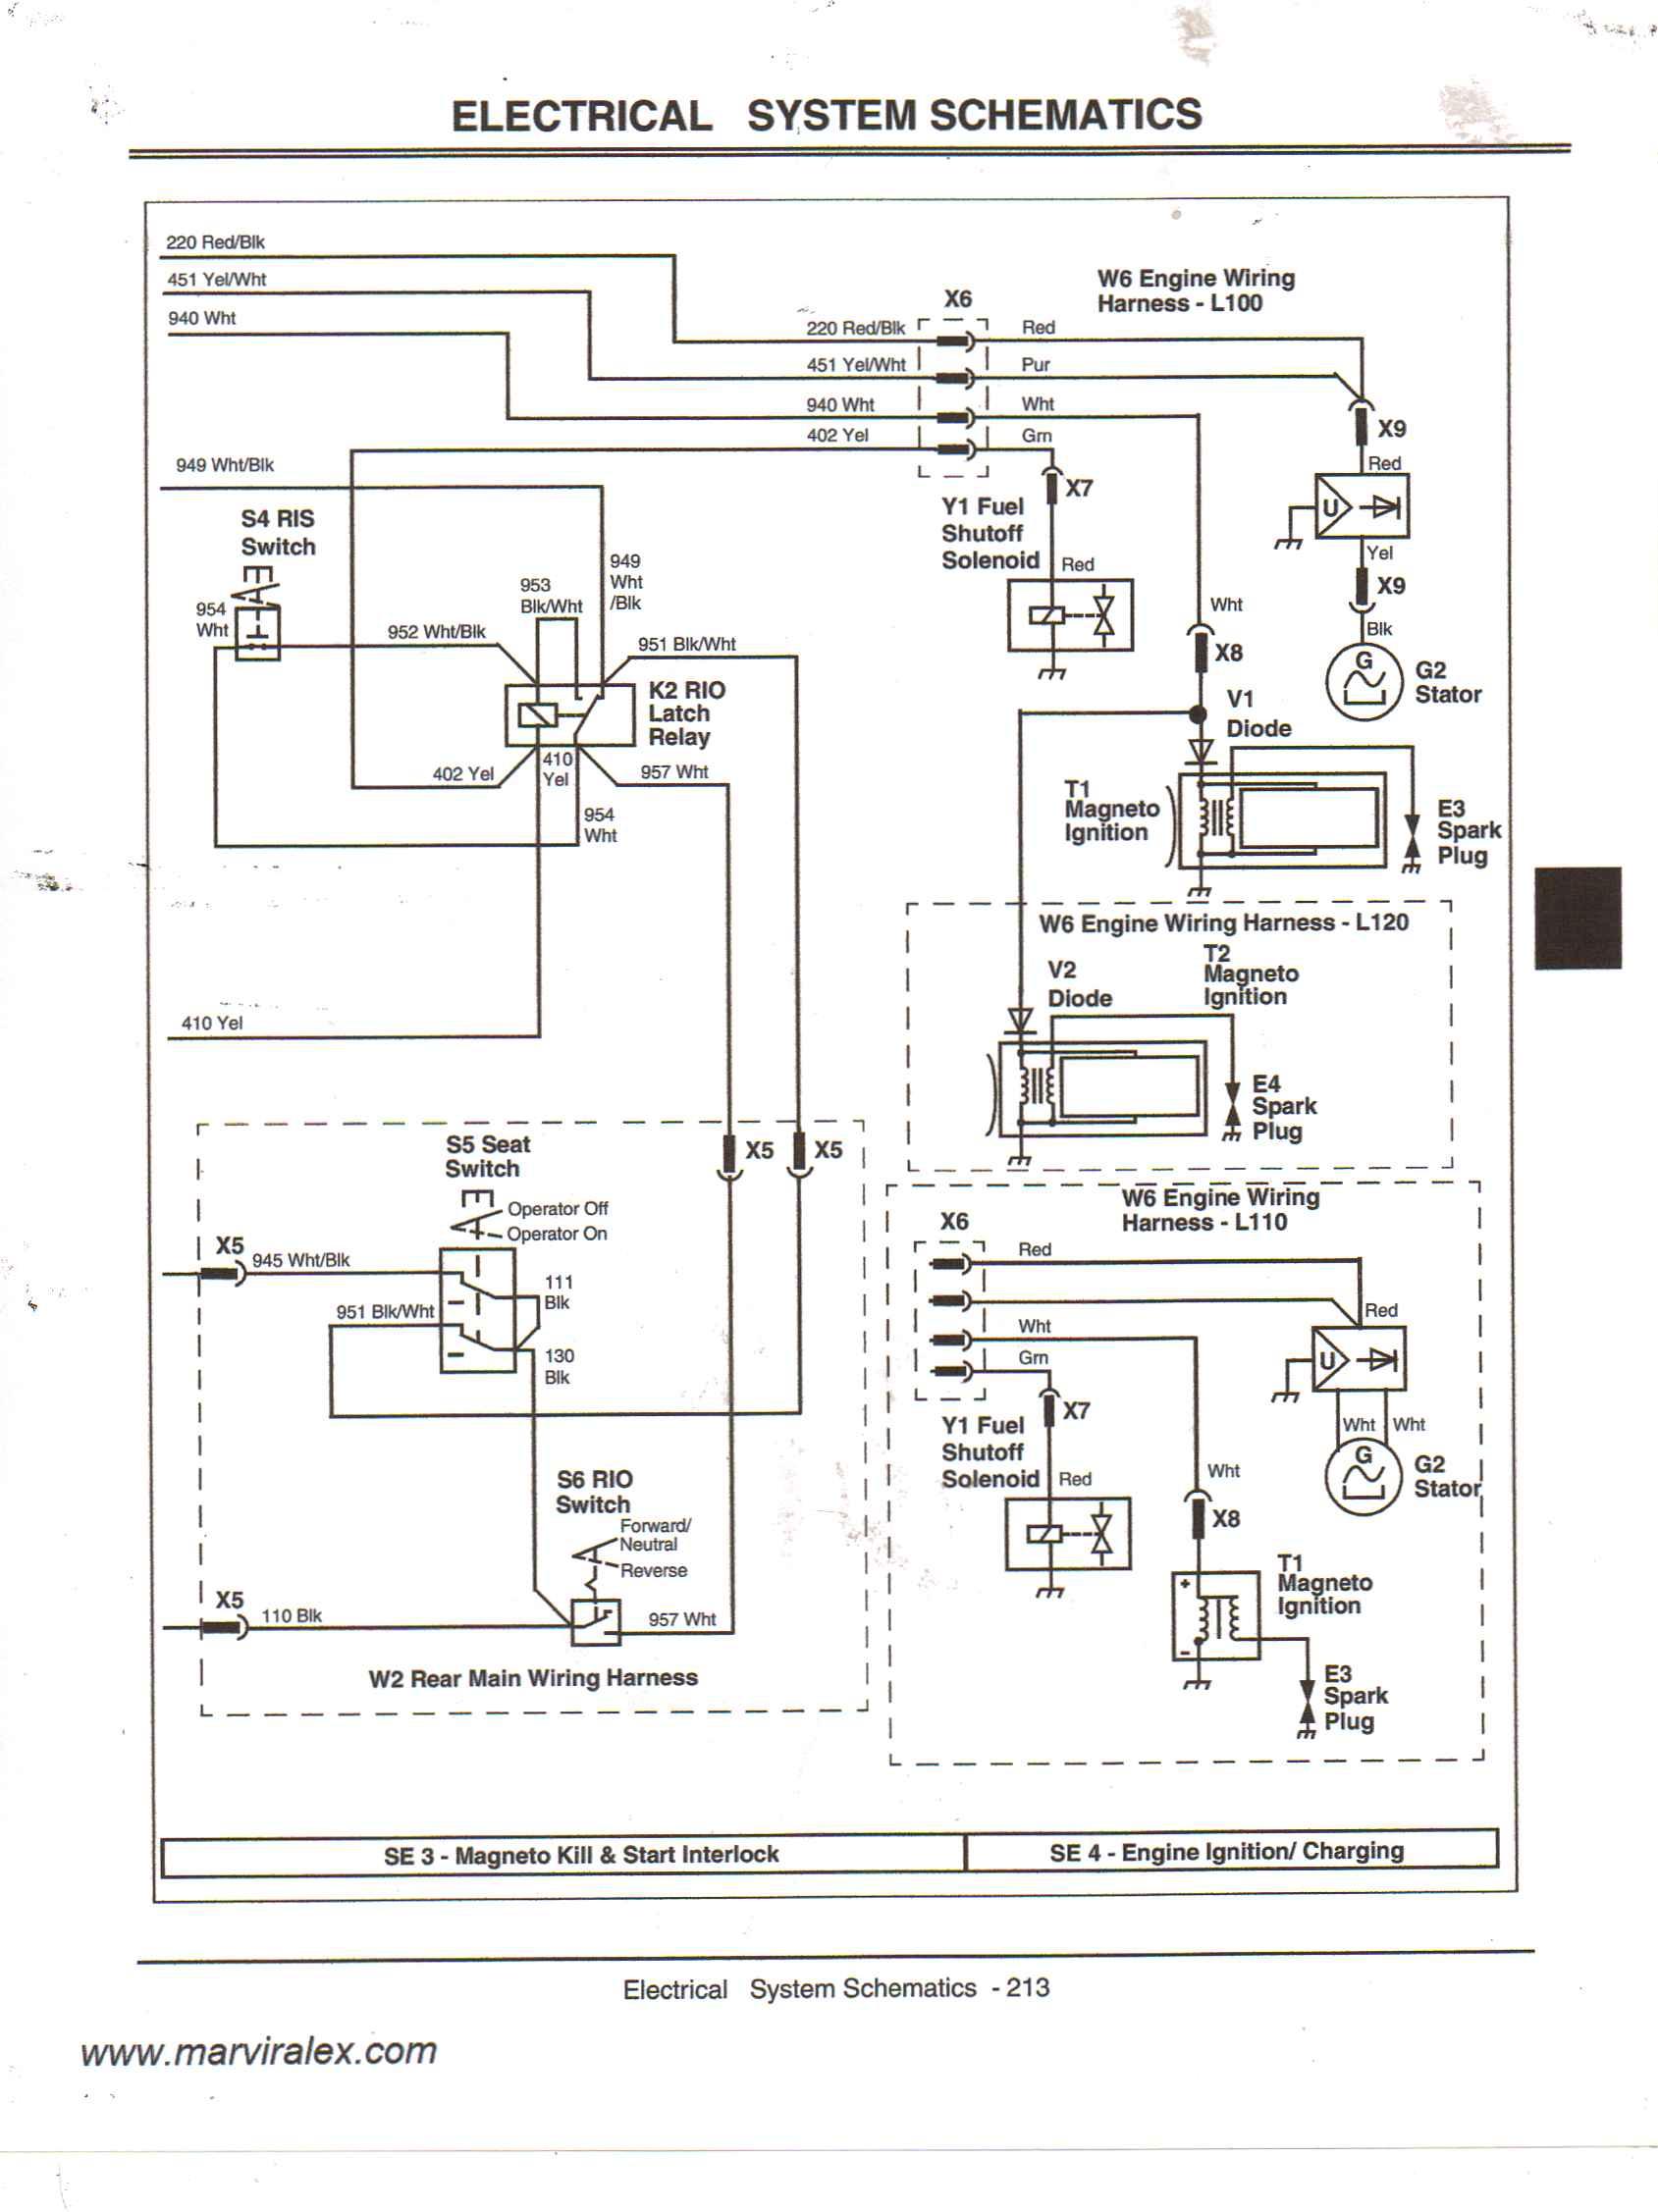 Gator Fuse Box | Wiring Library - Riding Lawn Mower Wiring Diagram